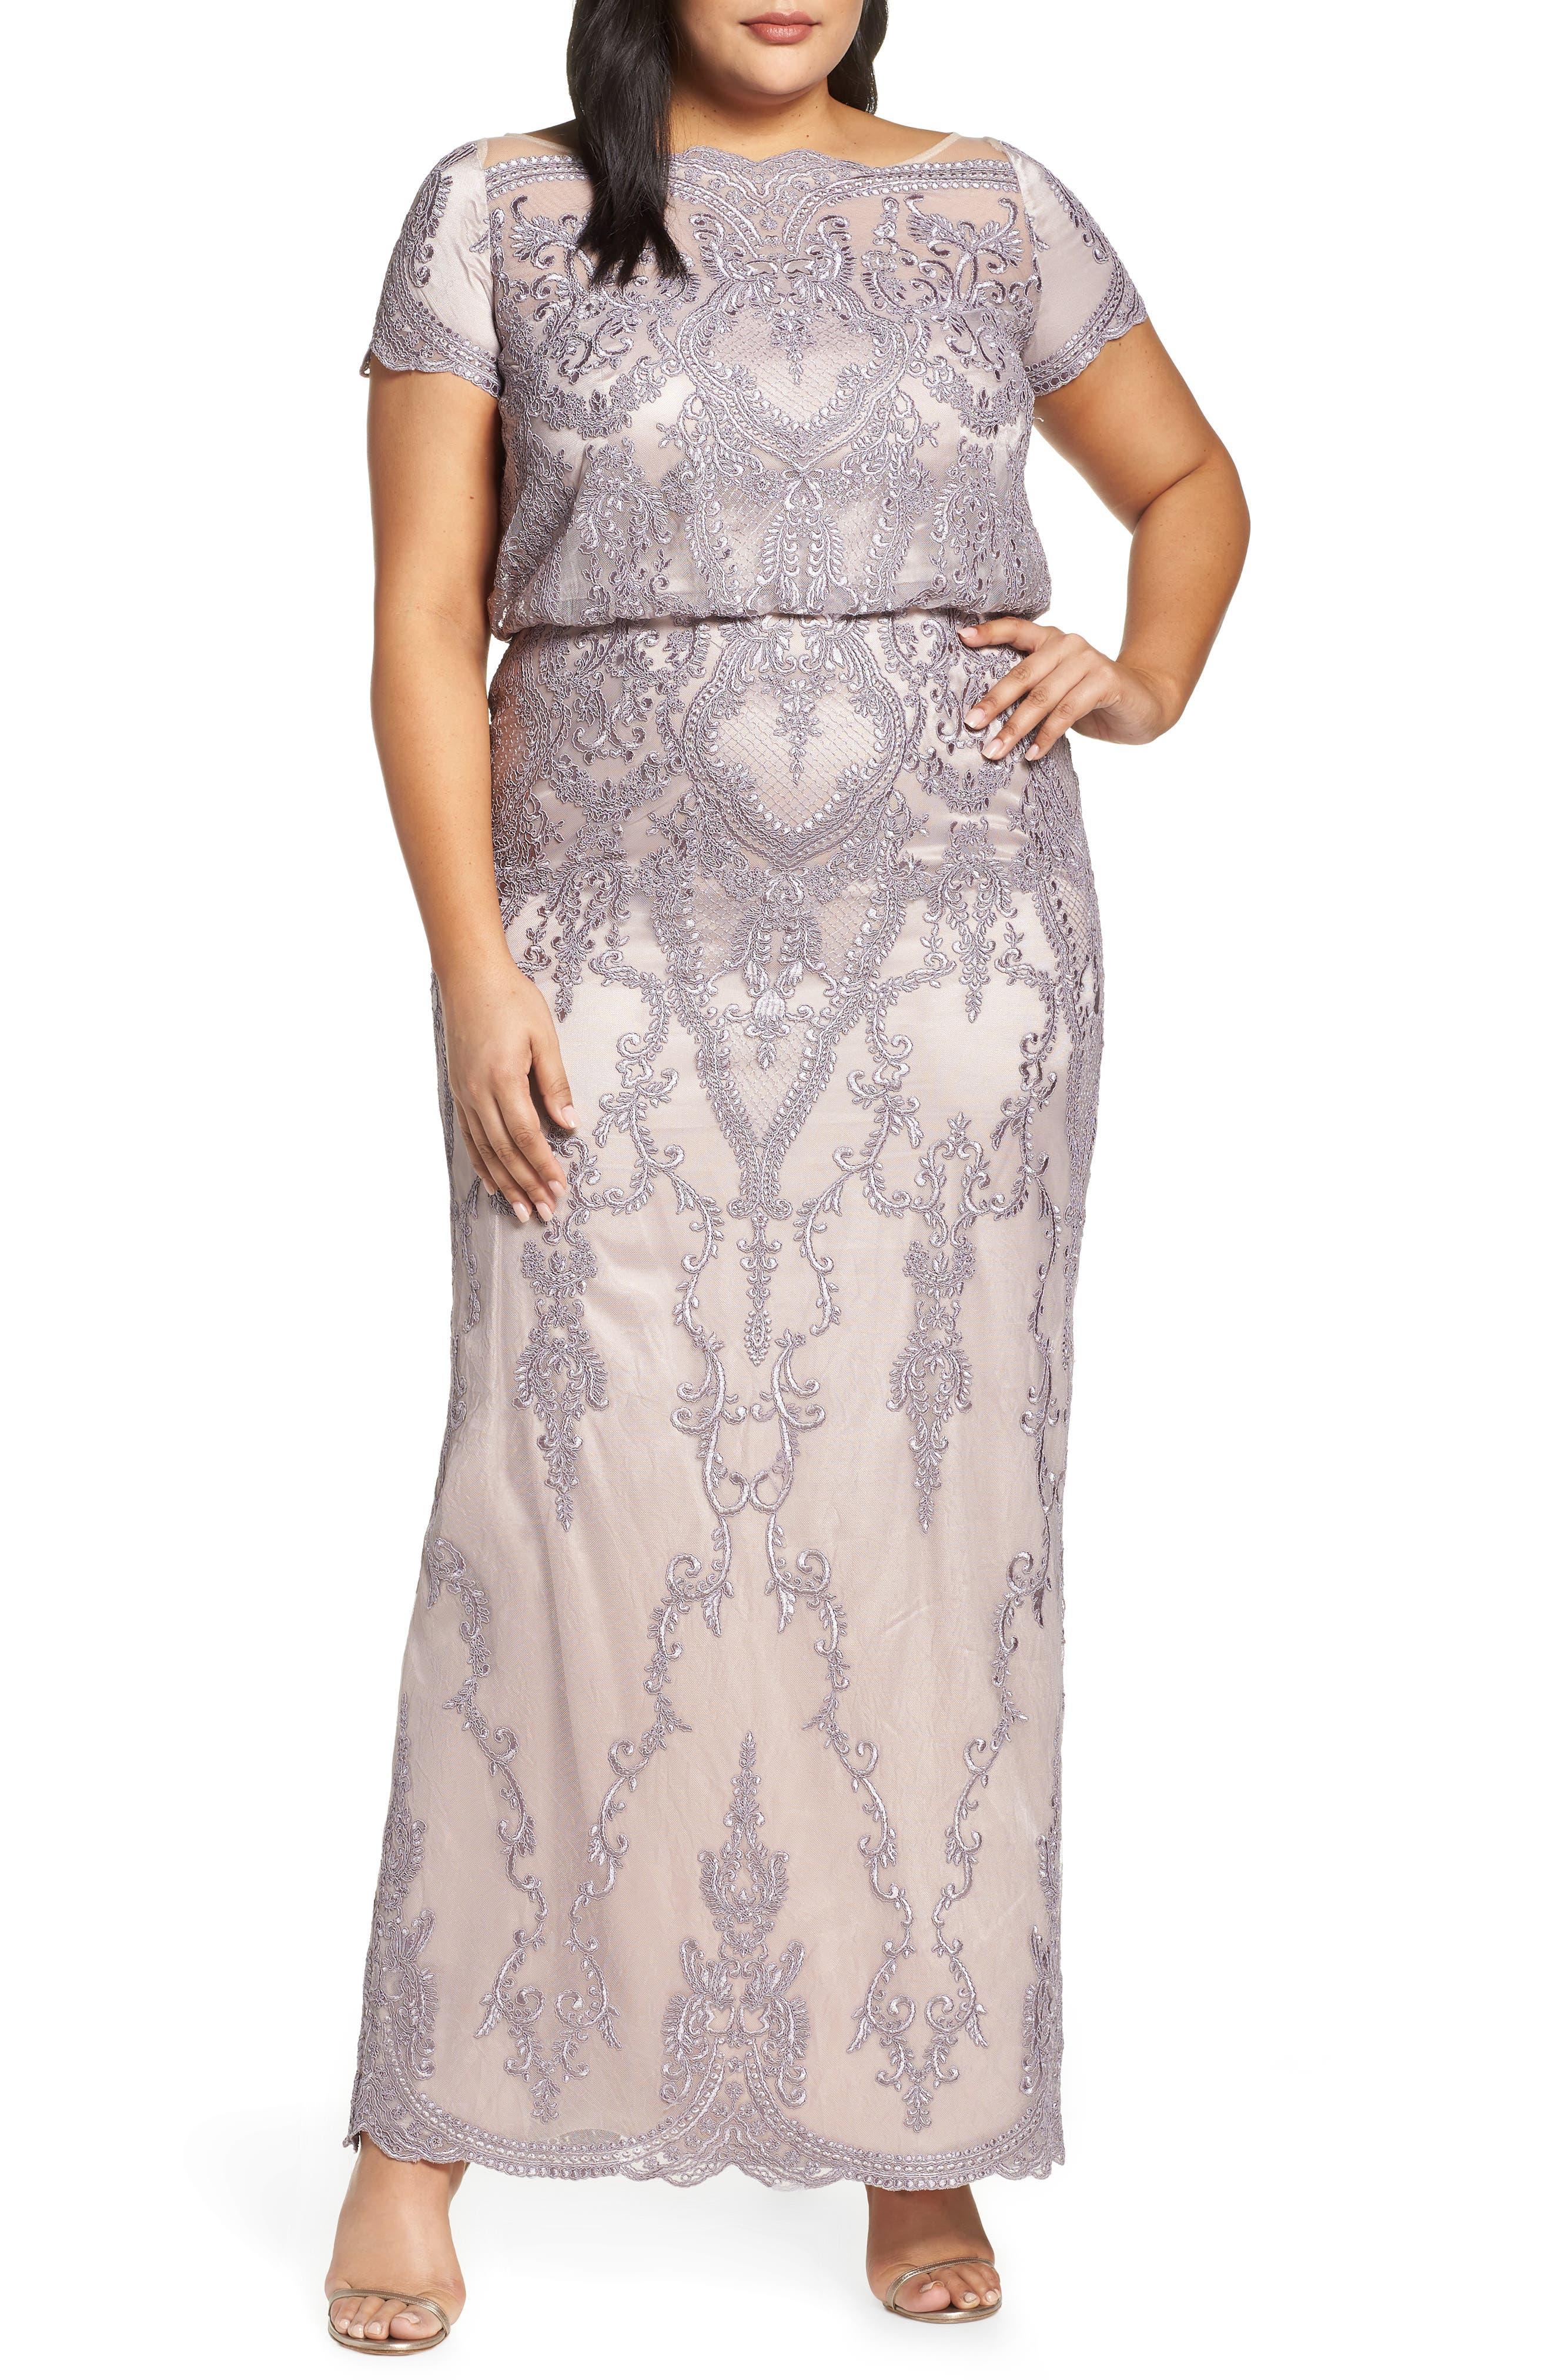 Plus Size Js Collections Scallop Embroidered Blouson Evening Dress, Purple